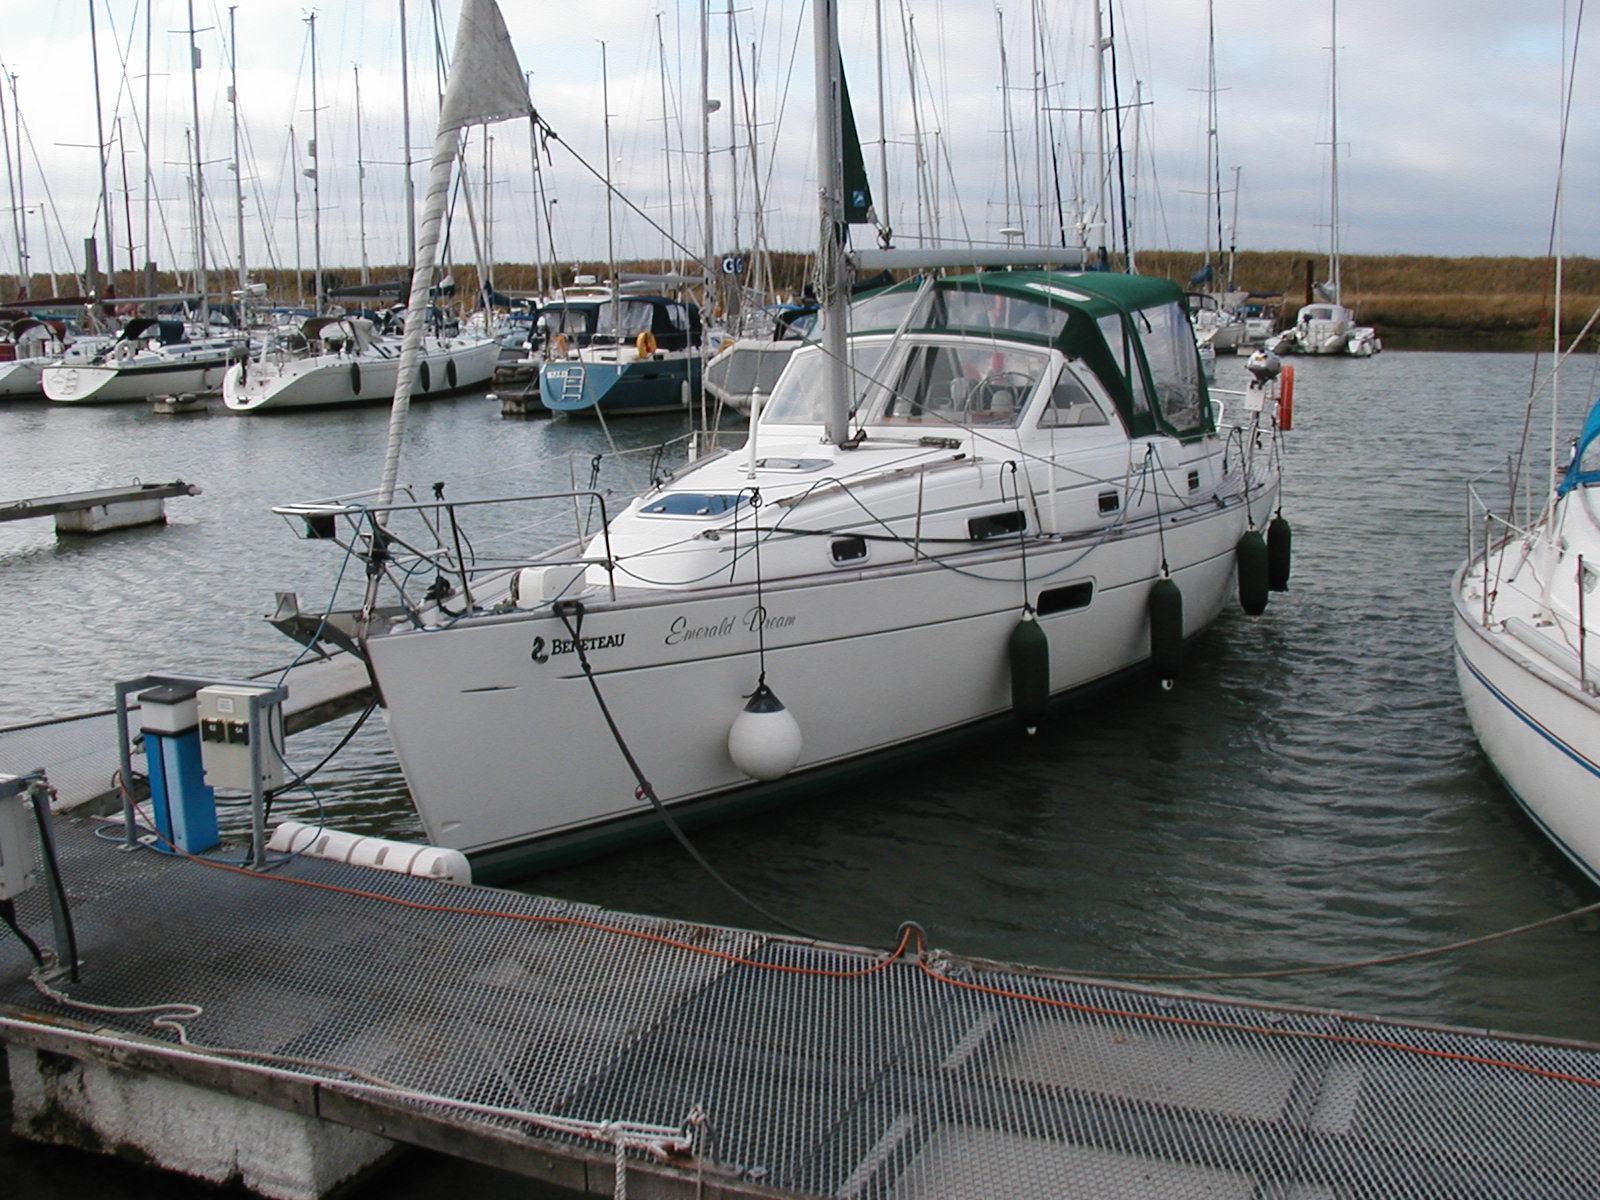 Beneteau Oceanis 36 CC, Titchmarsh Marina, Essex